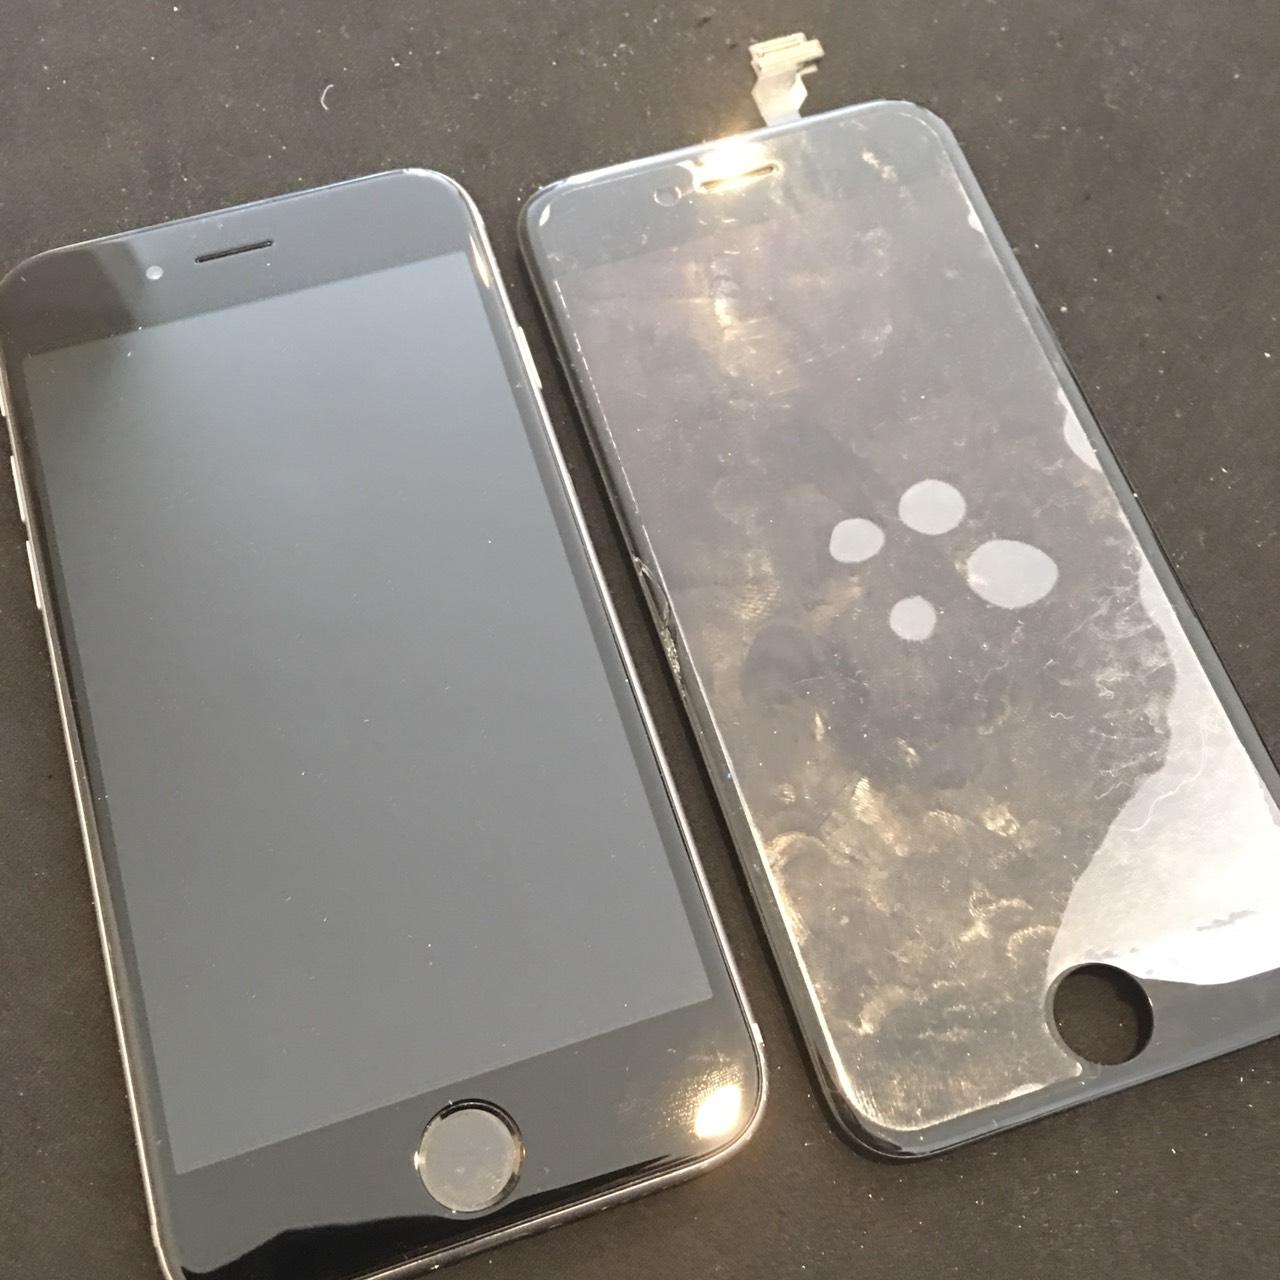 0324|iPhone6|液晶パネル交換修理